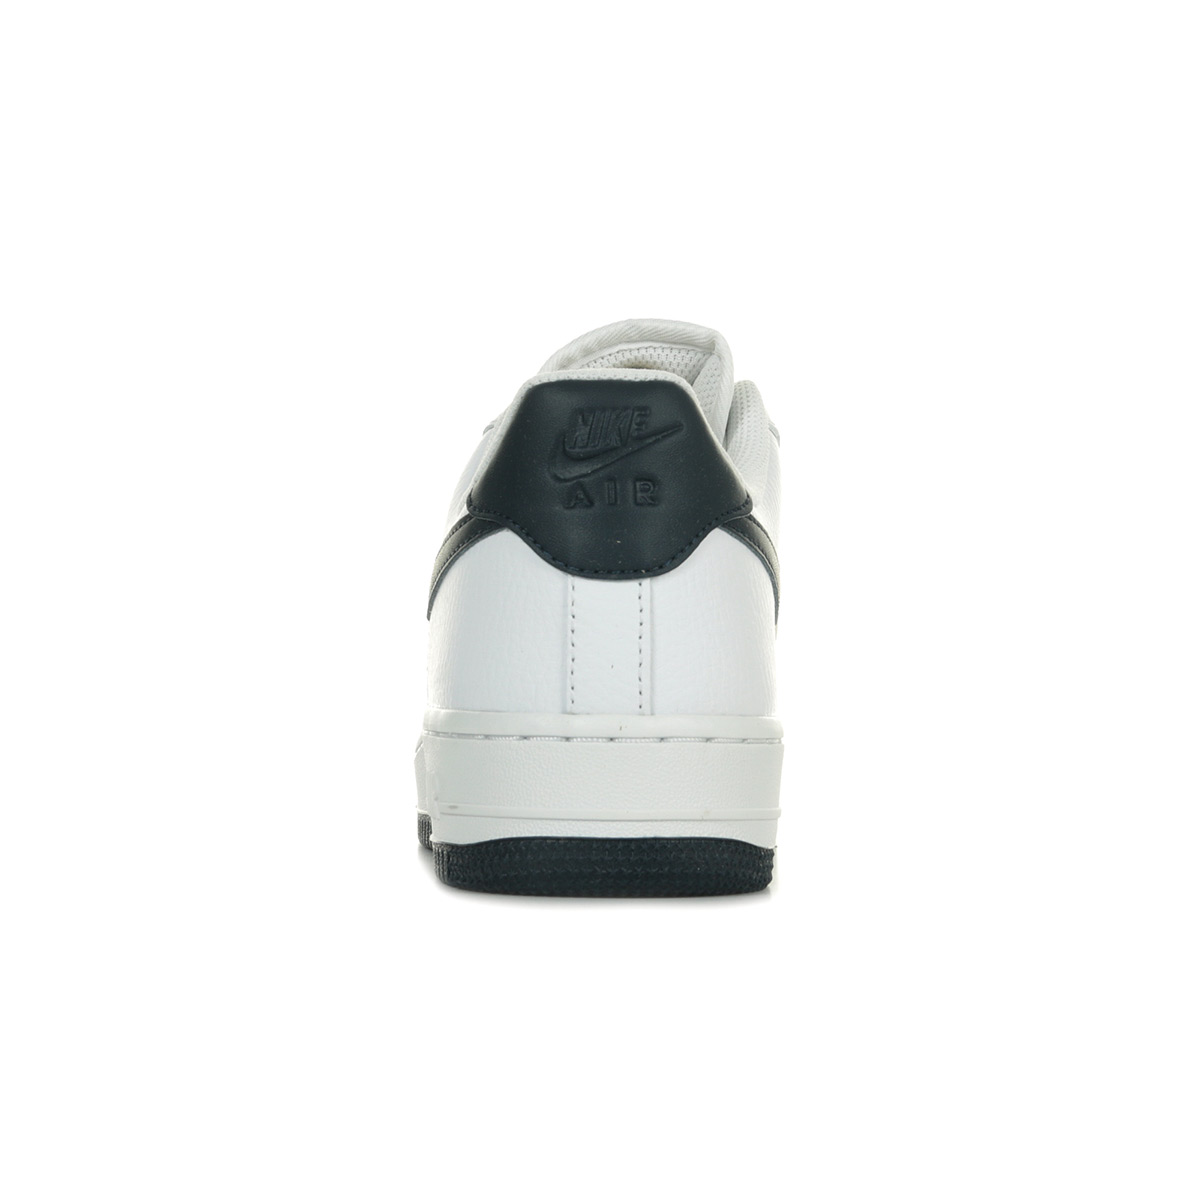 Nike Wn's Air Force 1 '07 LV8 AH0287108, Baskets mode femme